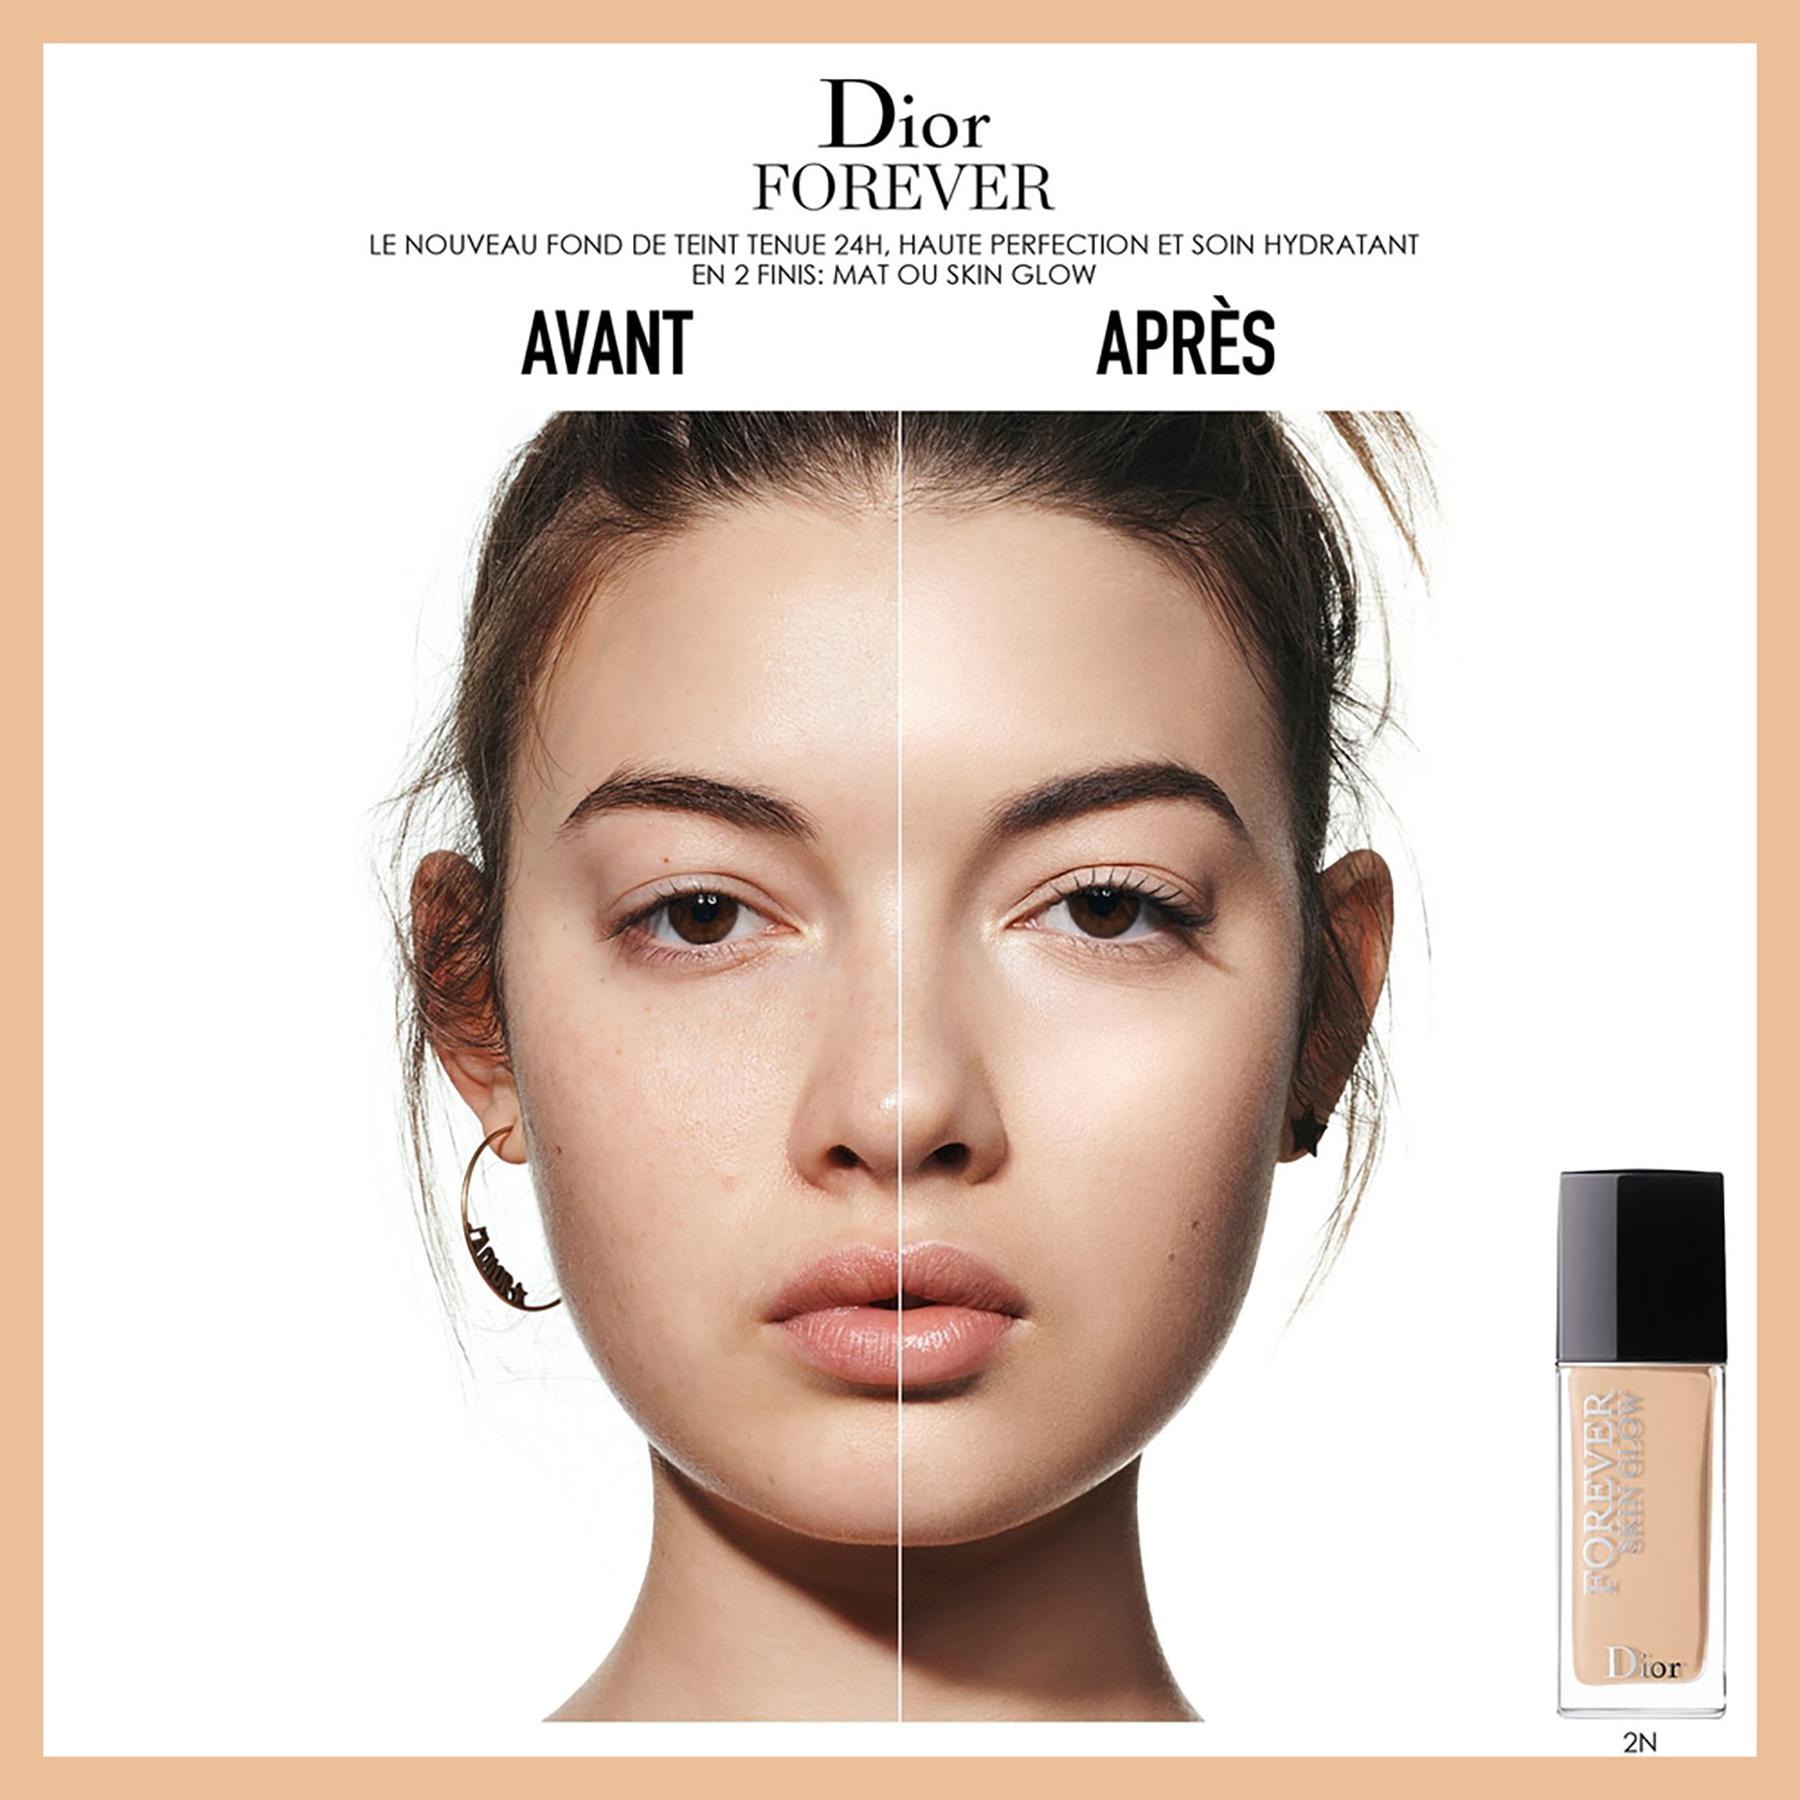 dior-forever-skin-glow-avant-apres